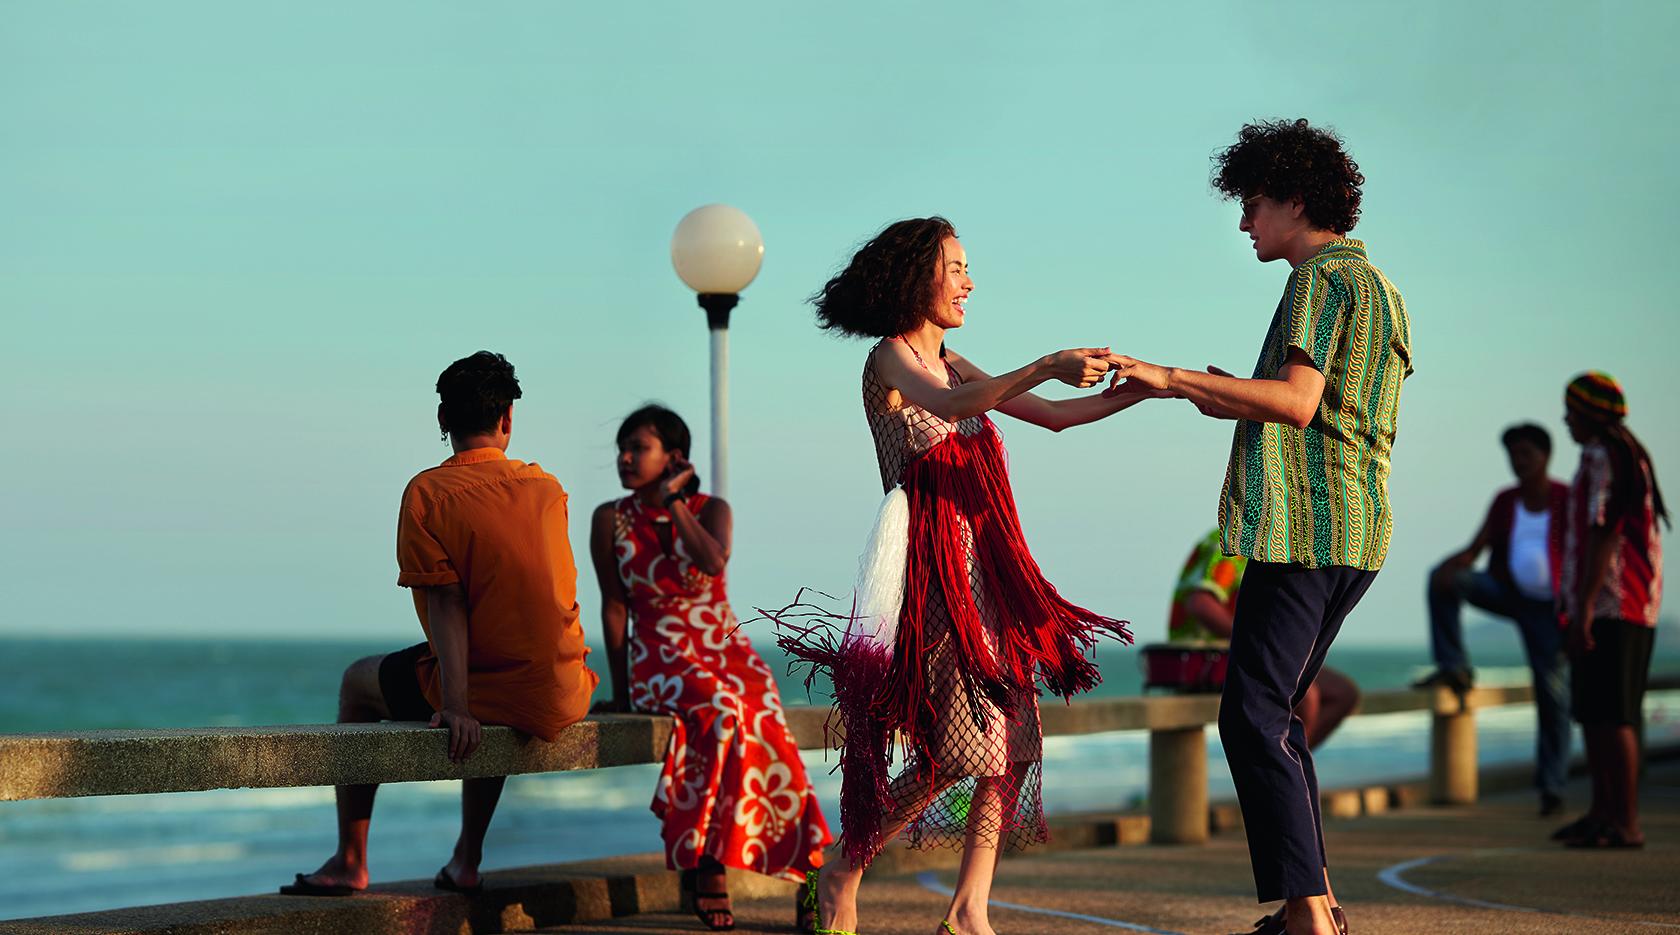 La Habana ลา ฮาบาน่า